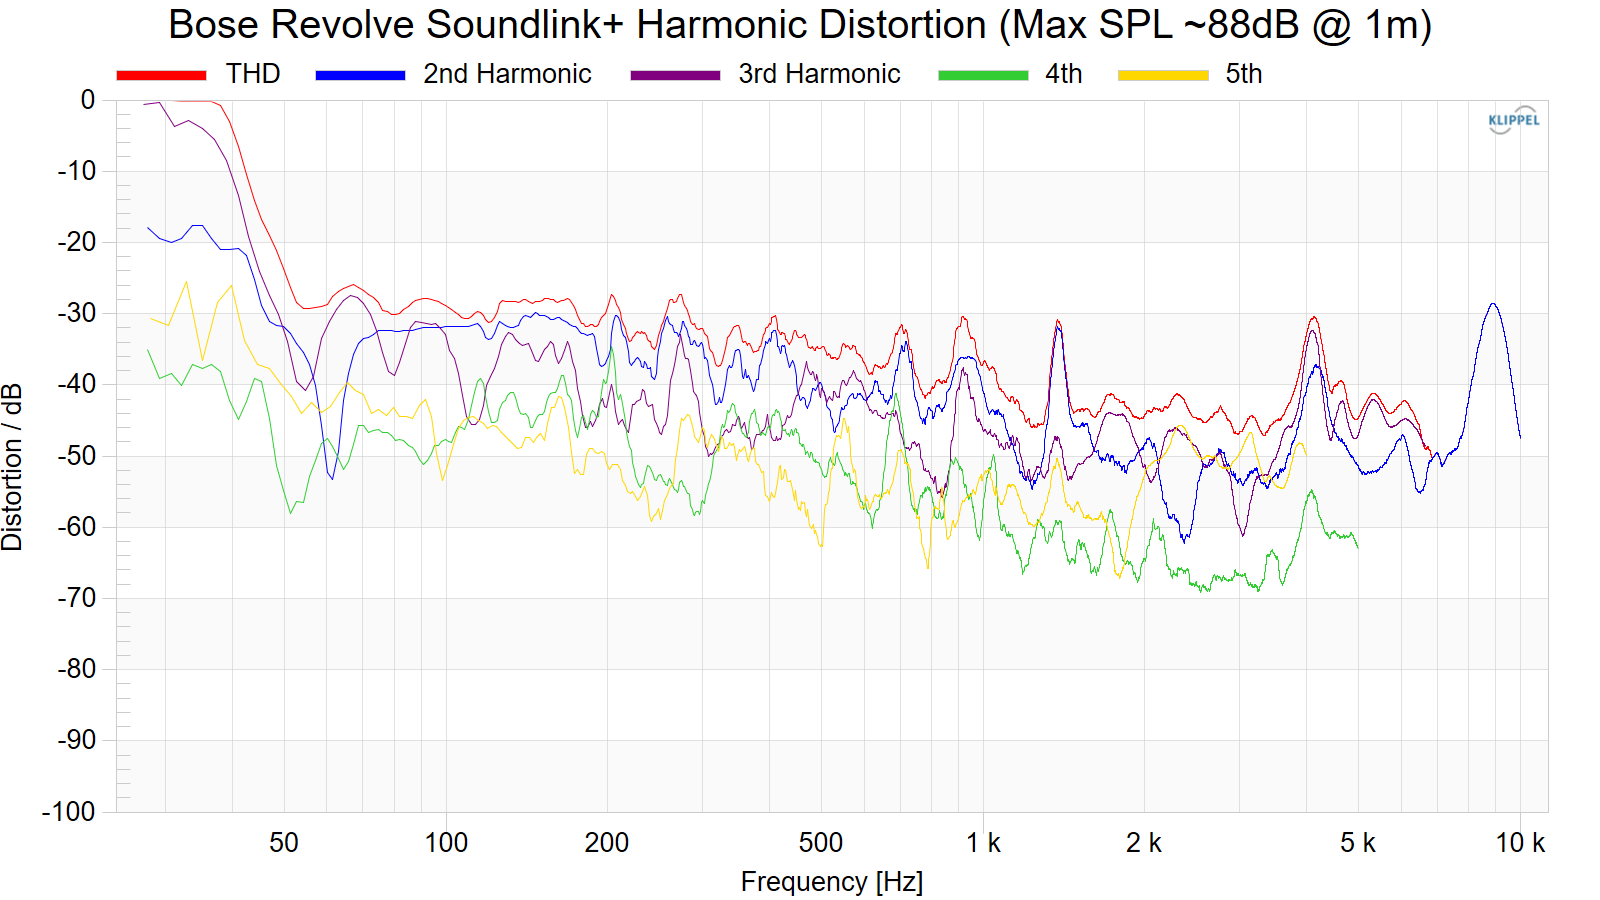 Bose%20Revolve%20SoundLink%2B%20Harmonic%20Distortion%20%28Max%20SPL%20~88dB%20%40%201m%29.png